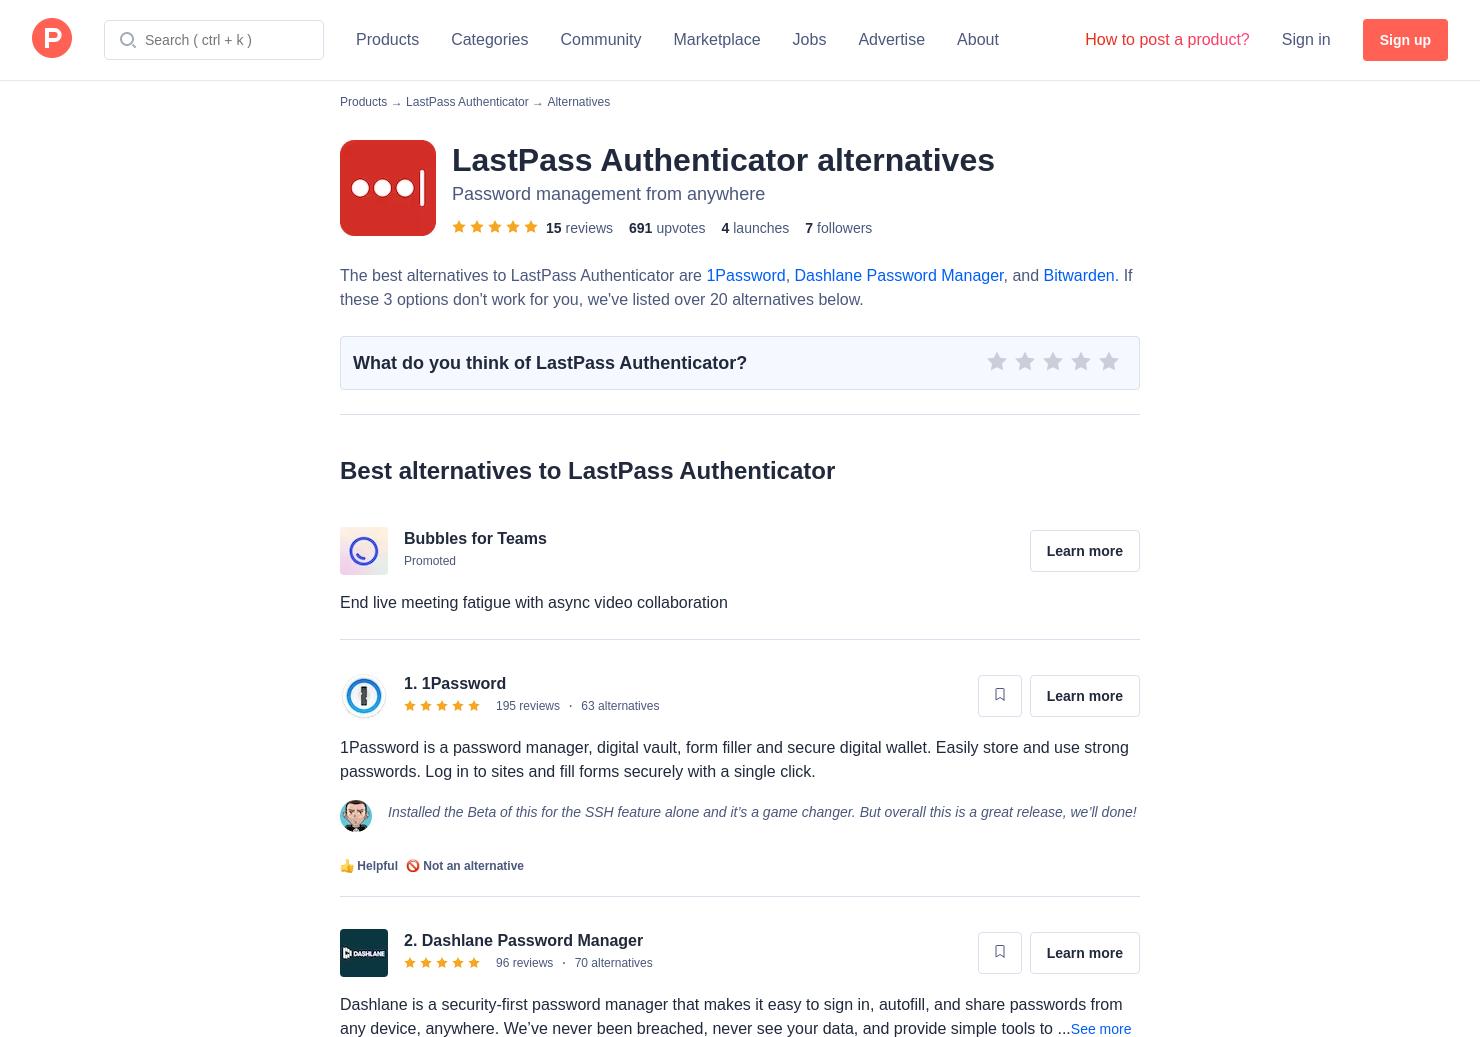 21 Alternatives to LastPass   Product Hunt